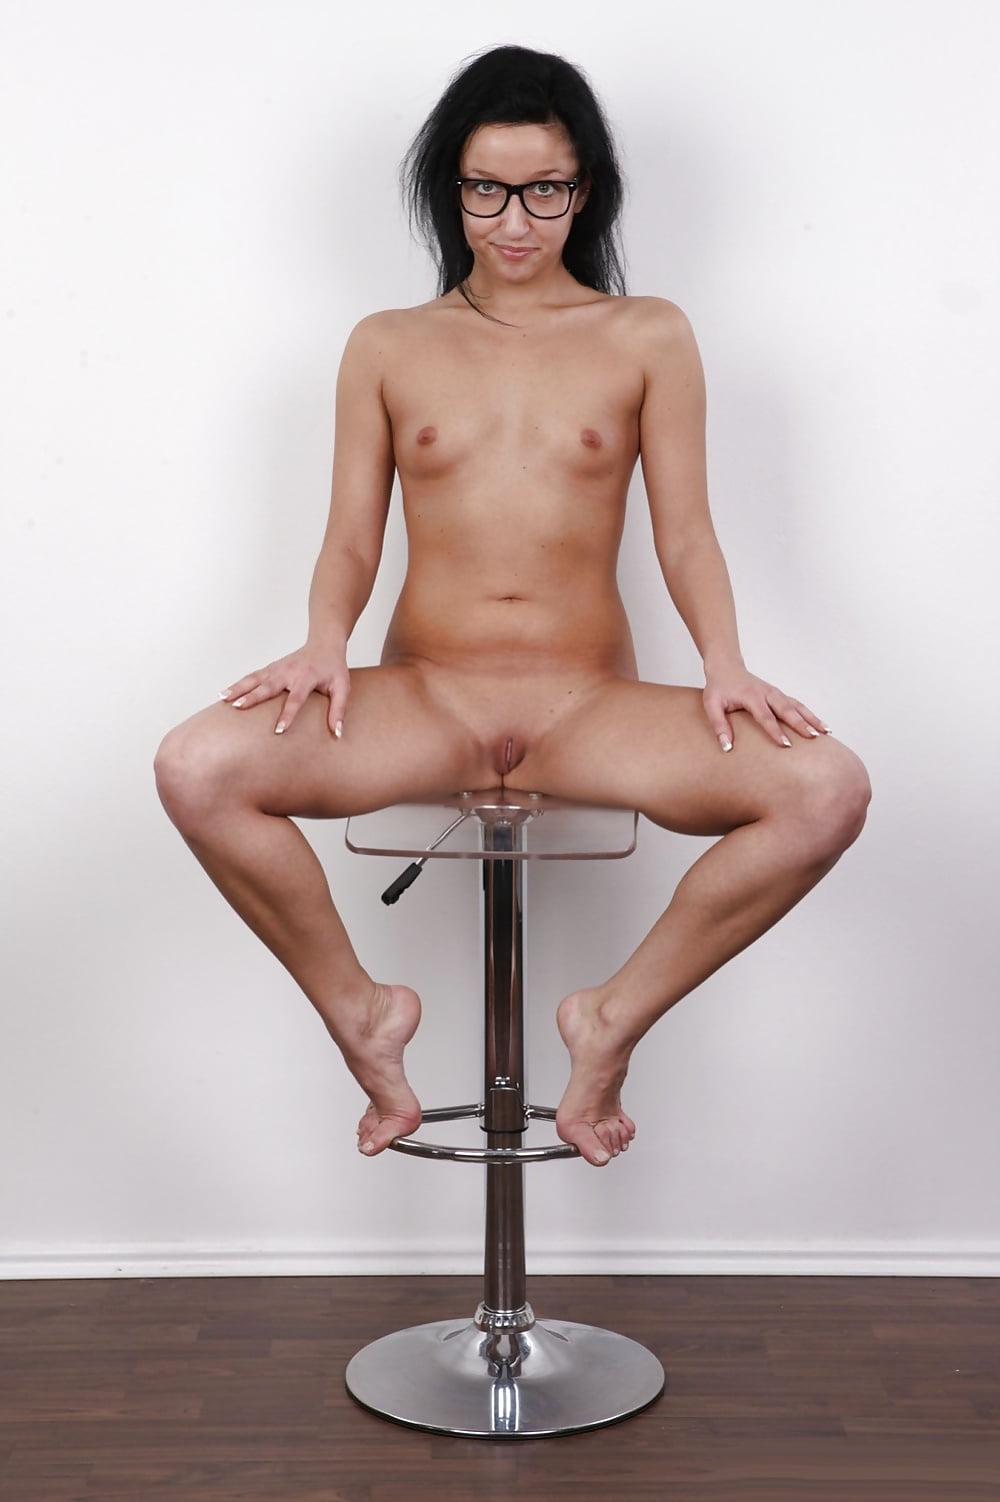 photo-girl-casting-slut-load-hot-nude-ten